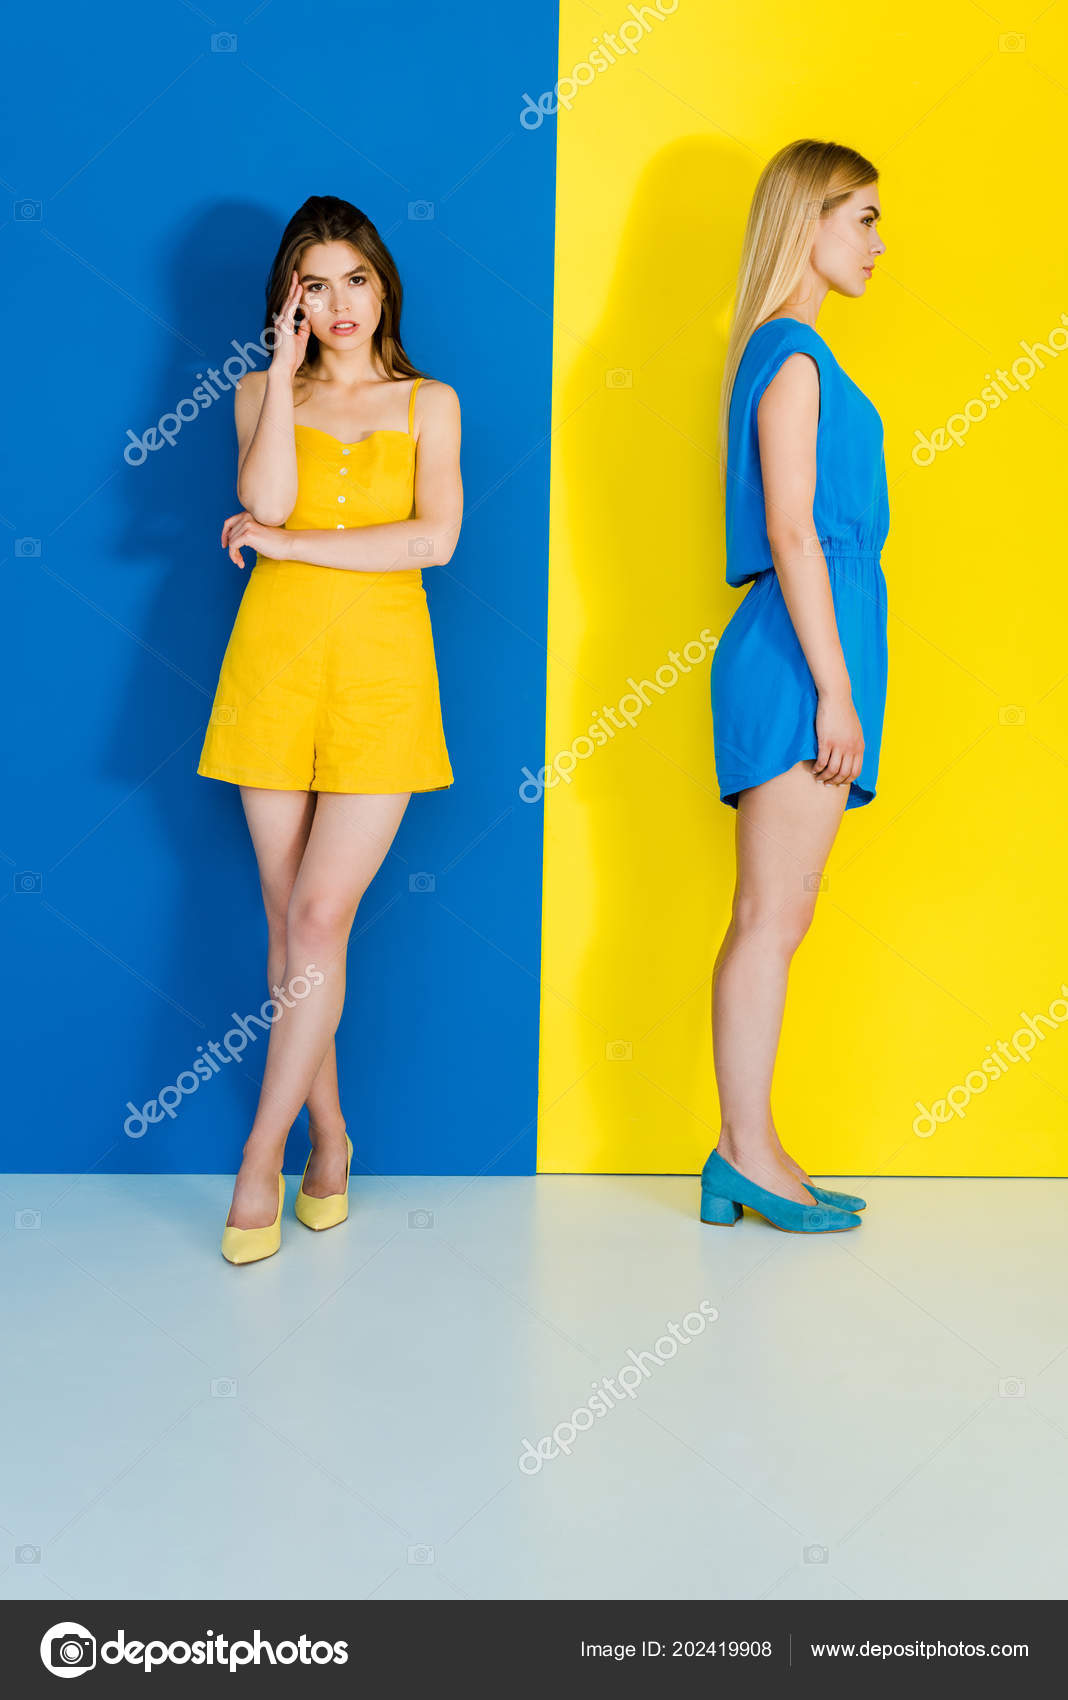 87aa27b1d Retrato Longitud Completa Mujeres Ropa Verano Azul Amarillo Fondo Contraste  — Foto de Stock